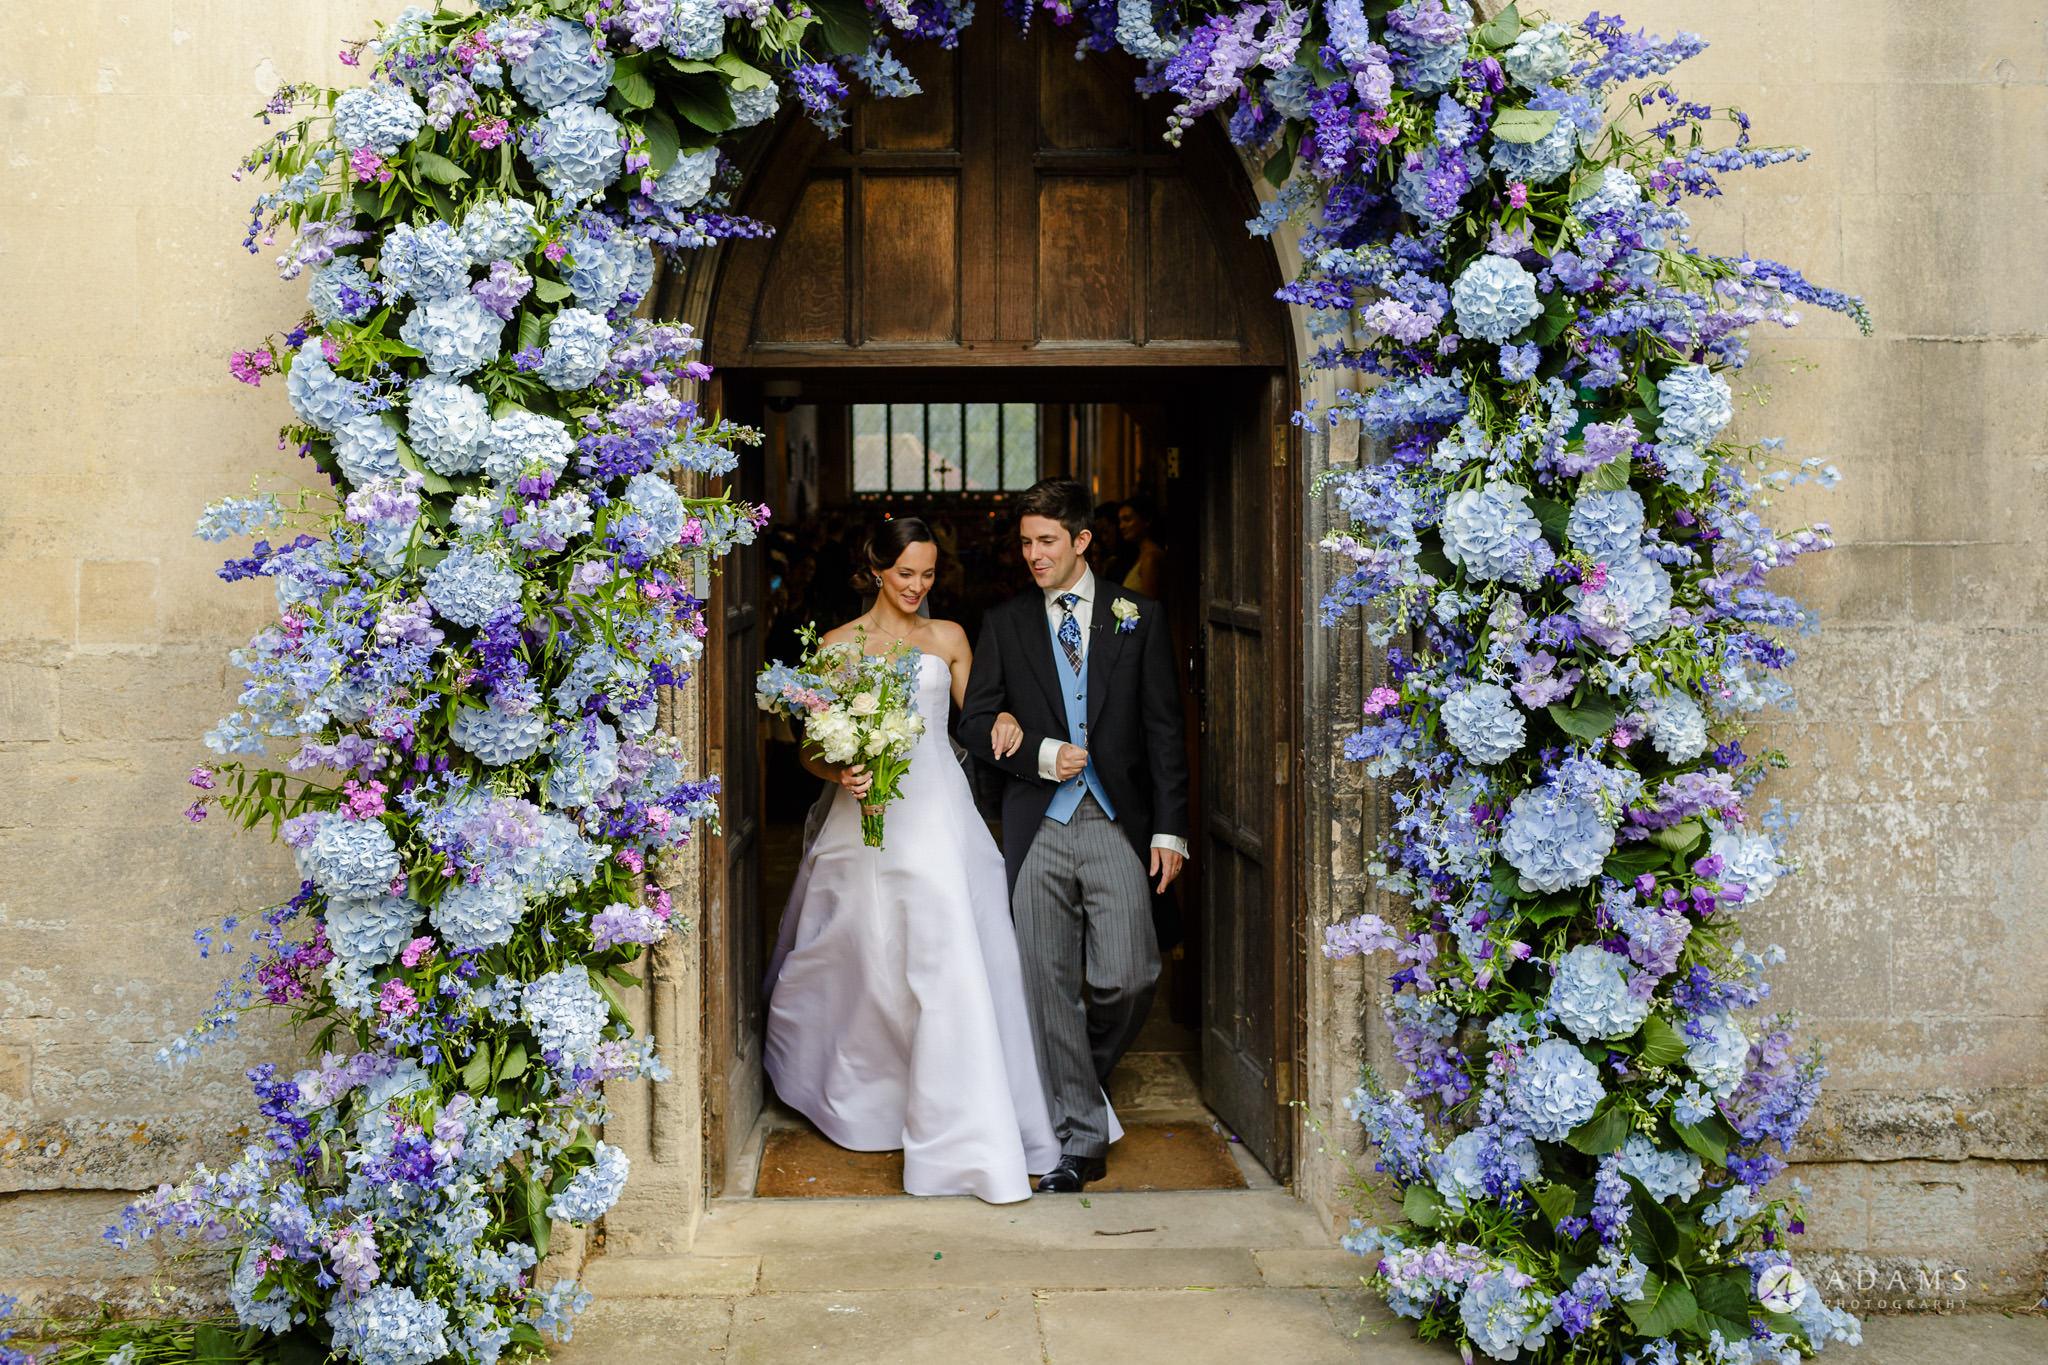 Trinity College Cambridge wedding bride and groom exit the church